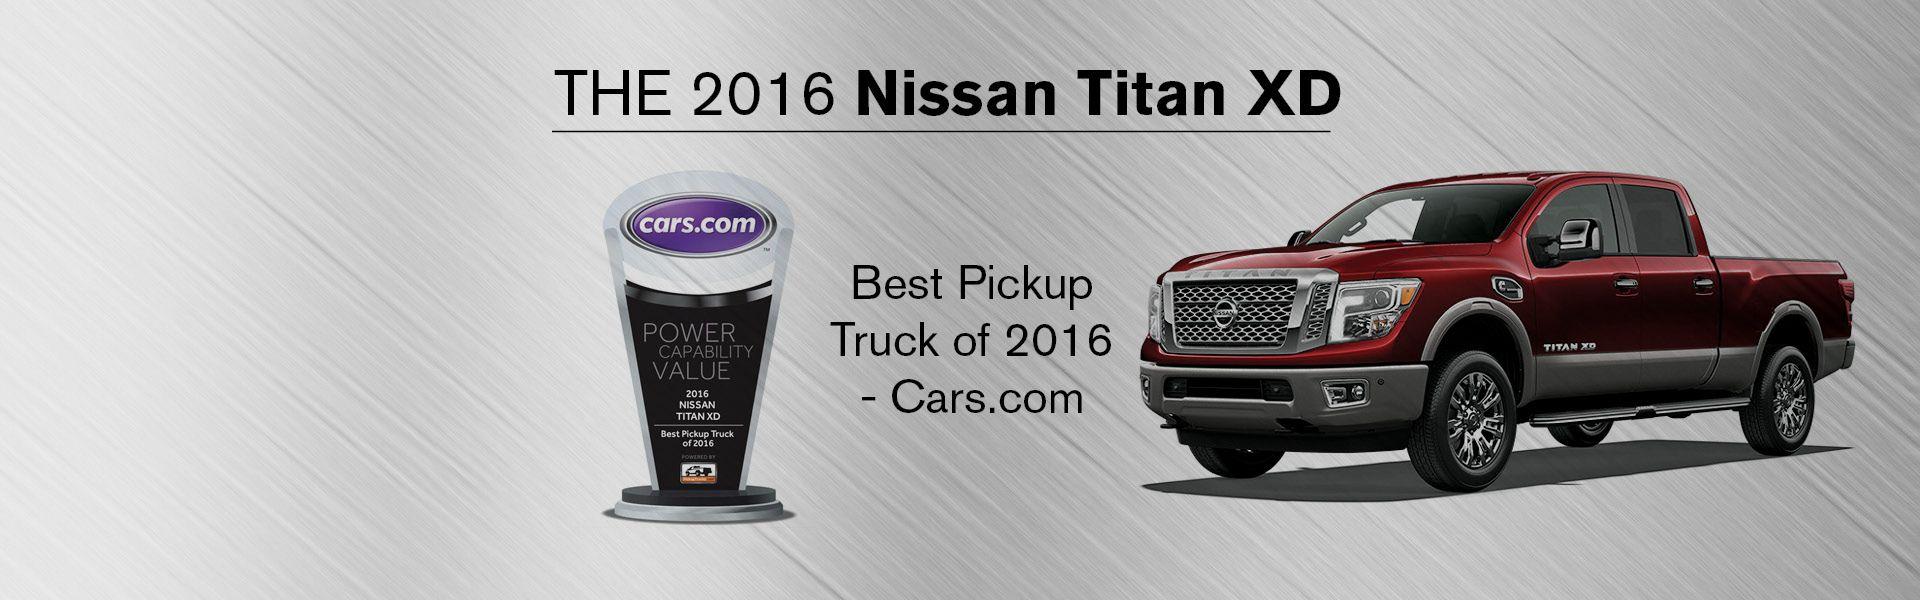 Nissan South Morrow | New And Used Car Dealership Near Atlanta GA